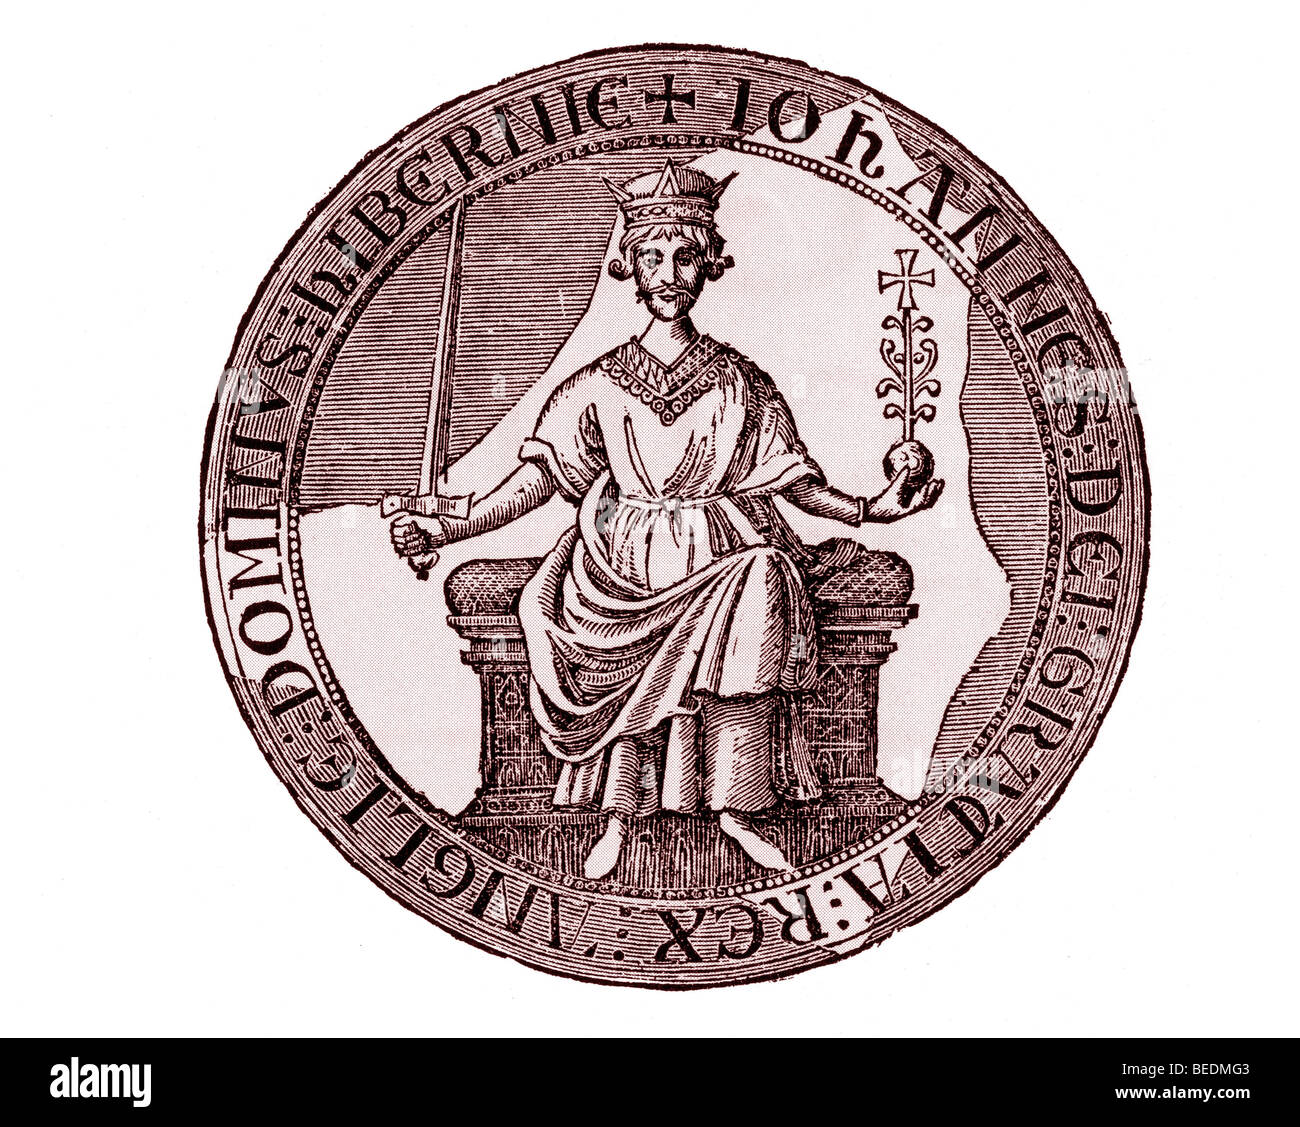 KING JOHN The Royal seal as fixed to the Magna Carta - Stock Image